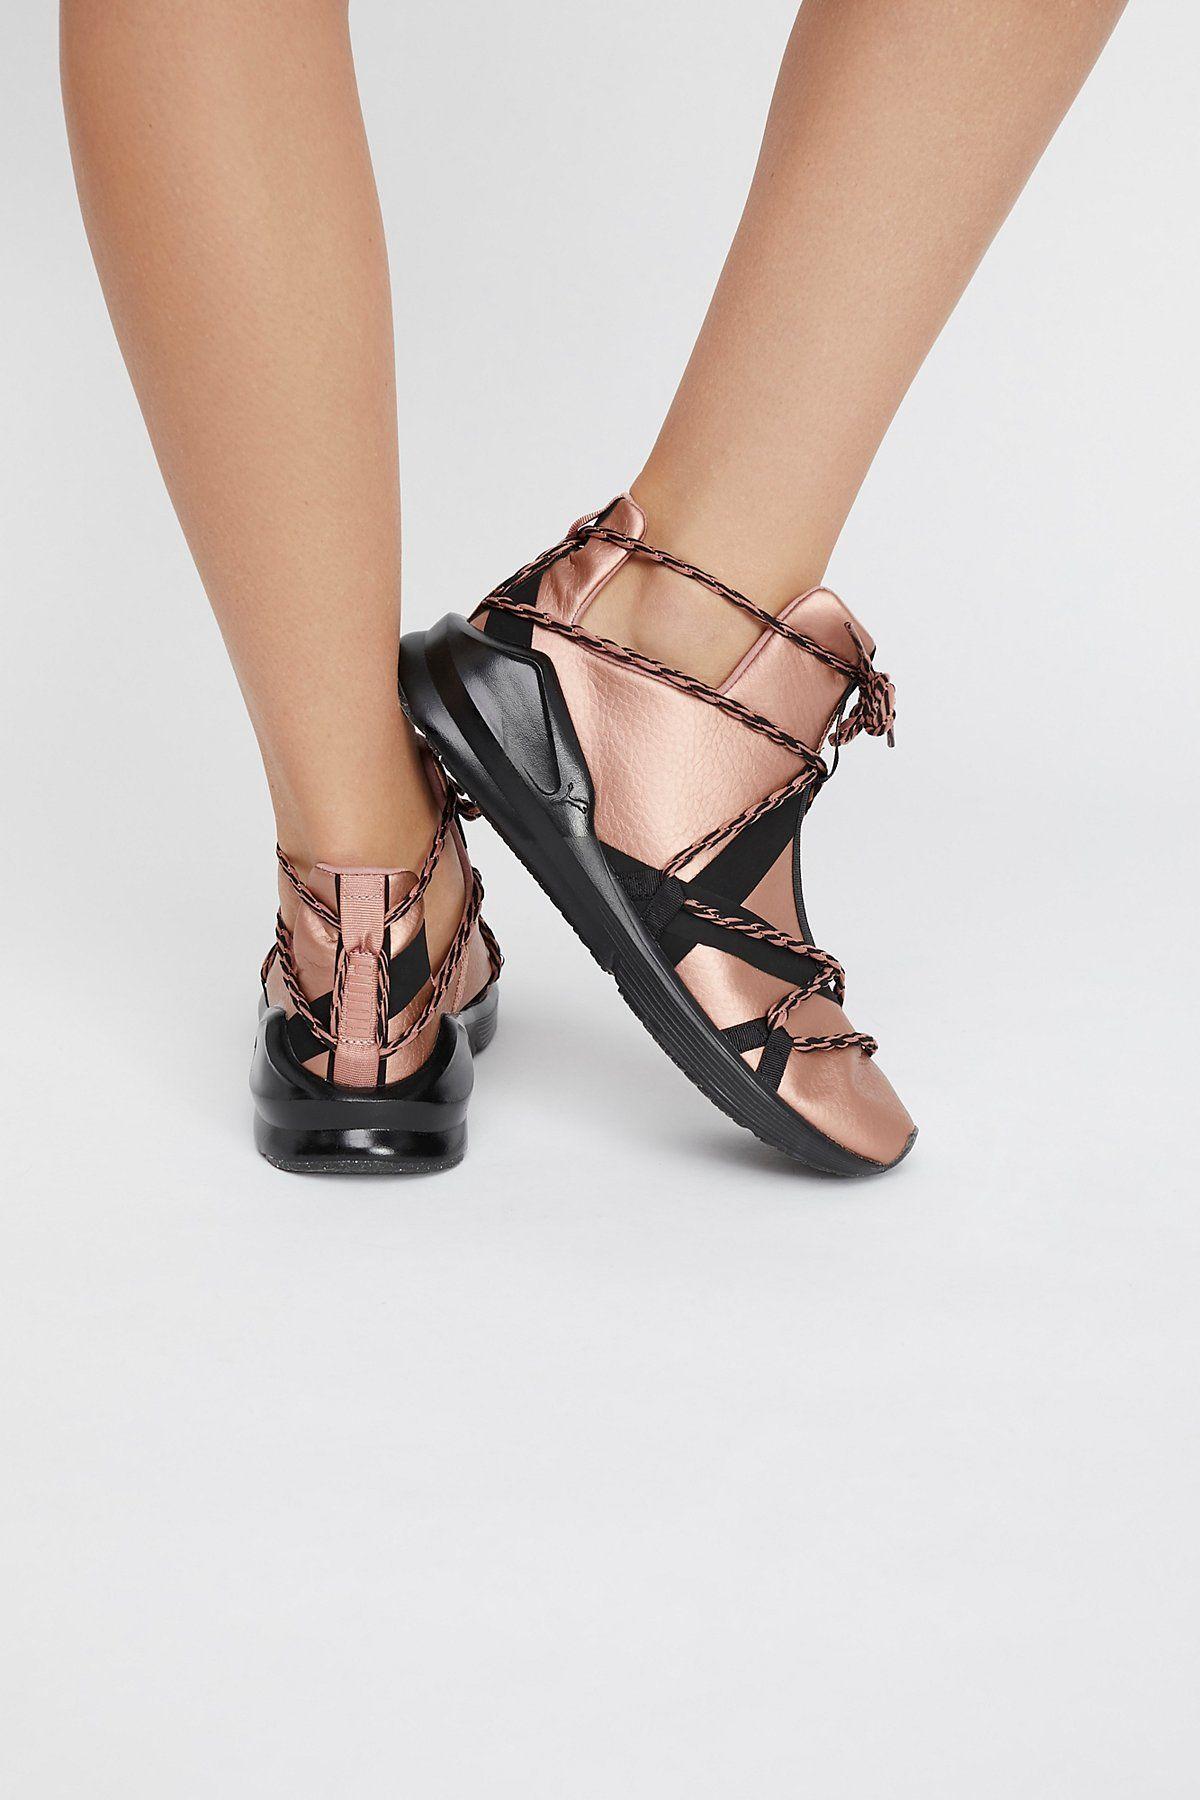 Copper Fierce Rope High-Top Sneaker